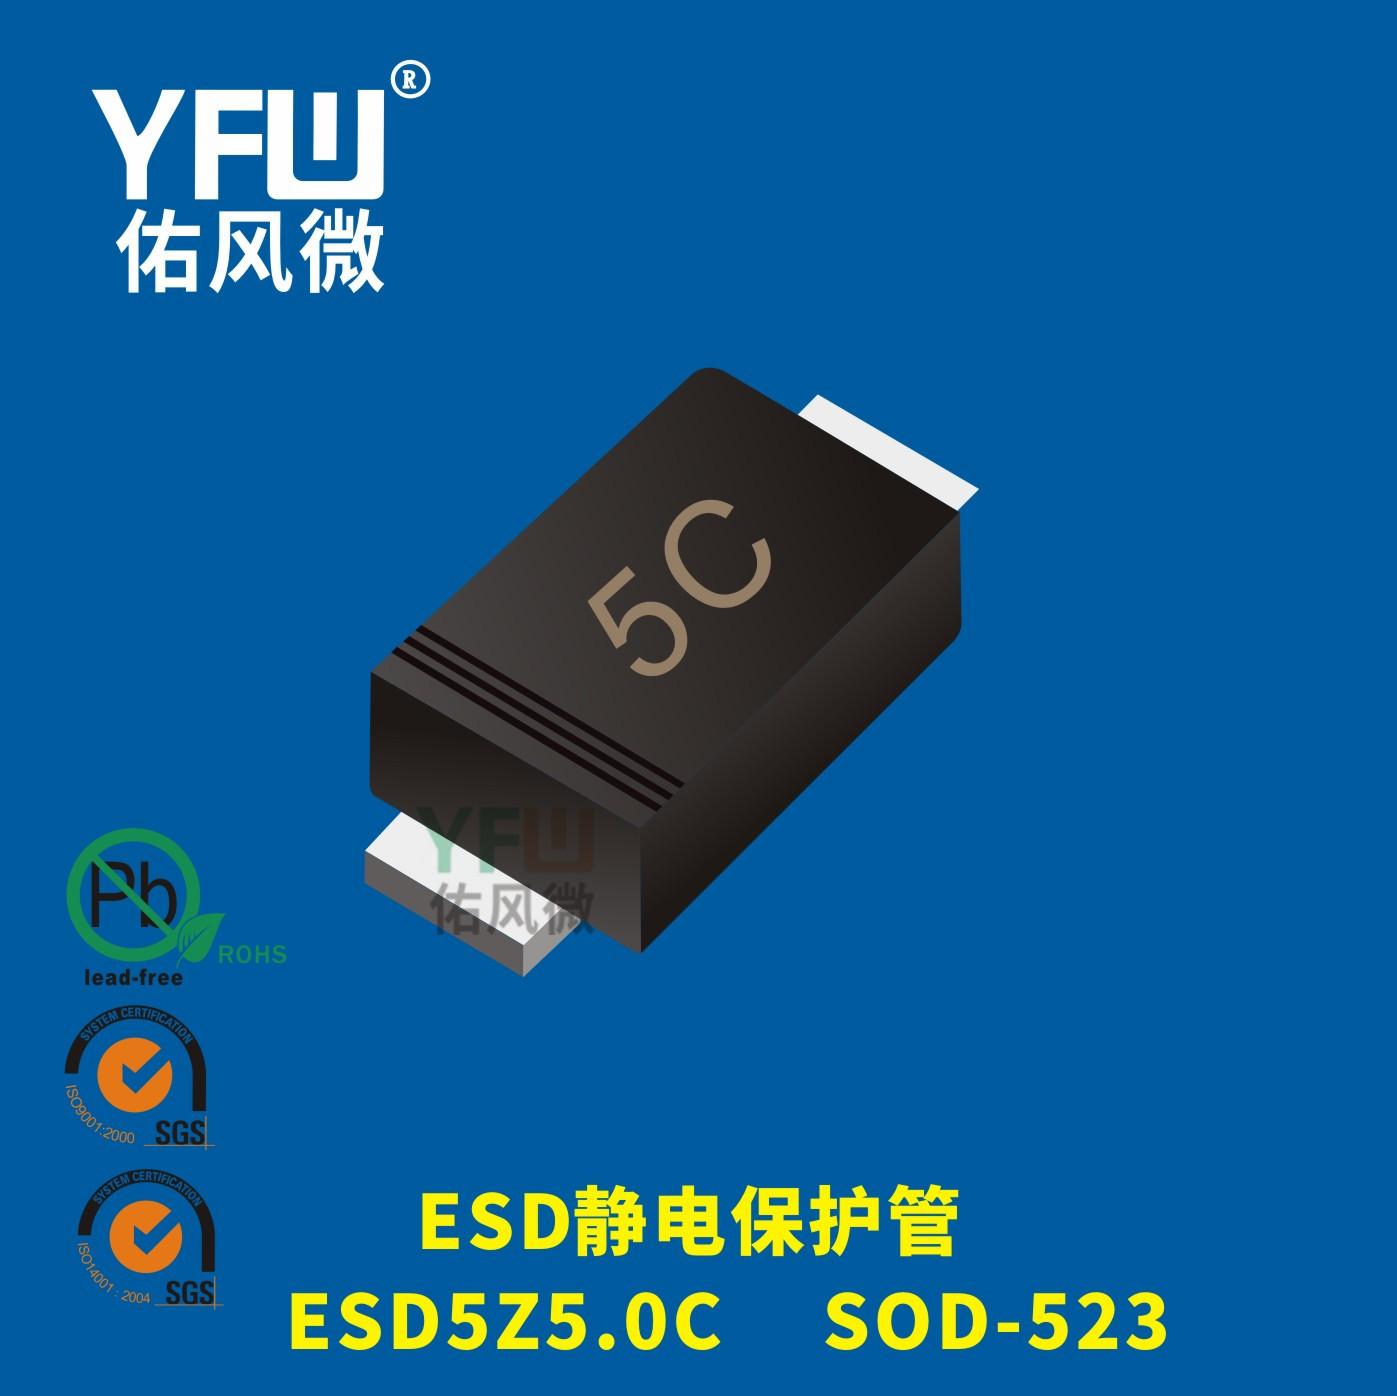 ESD5Z5.0C   SOD-523封装 ESD保护管印字5C  佑风微品牌